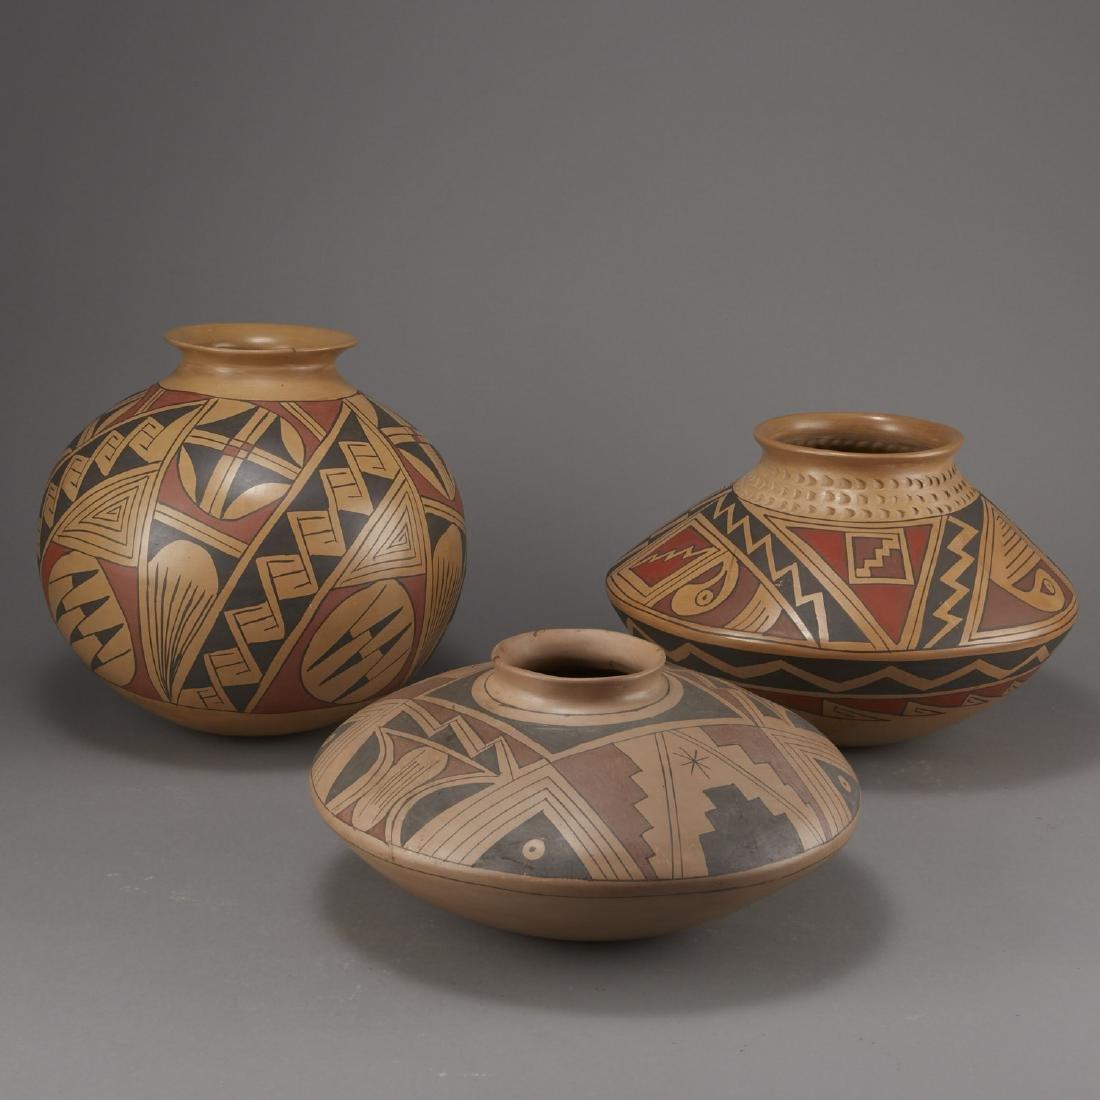 Group of 3 Large Polychrome Pottery Jars